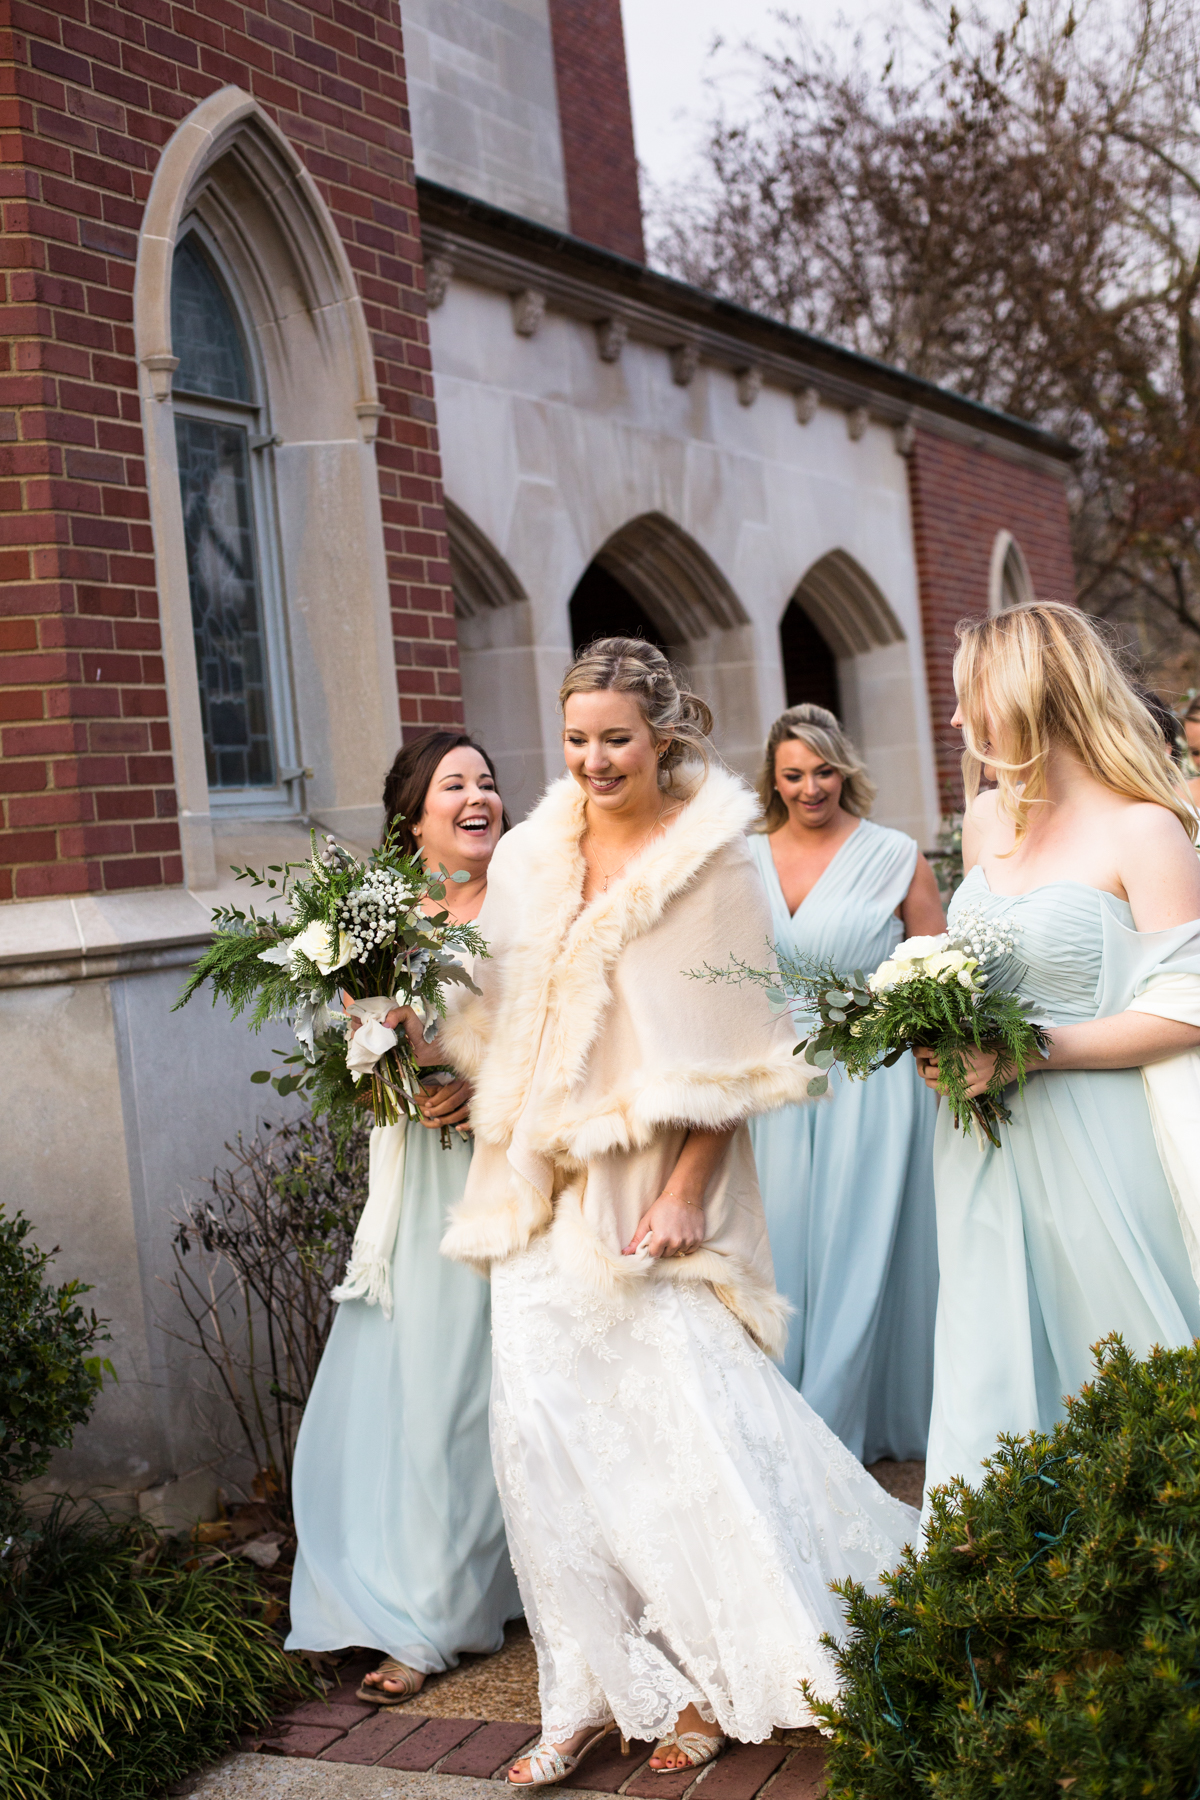 Kelli-and-Matt-Nashville-Wedding-Sneak-Peak-0170.jpg